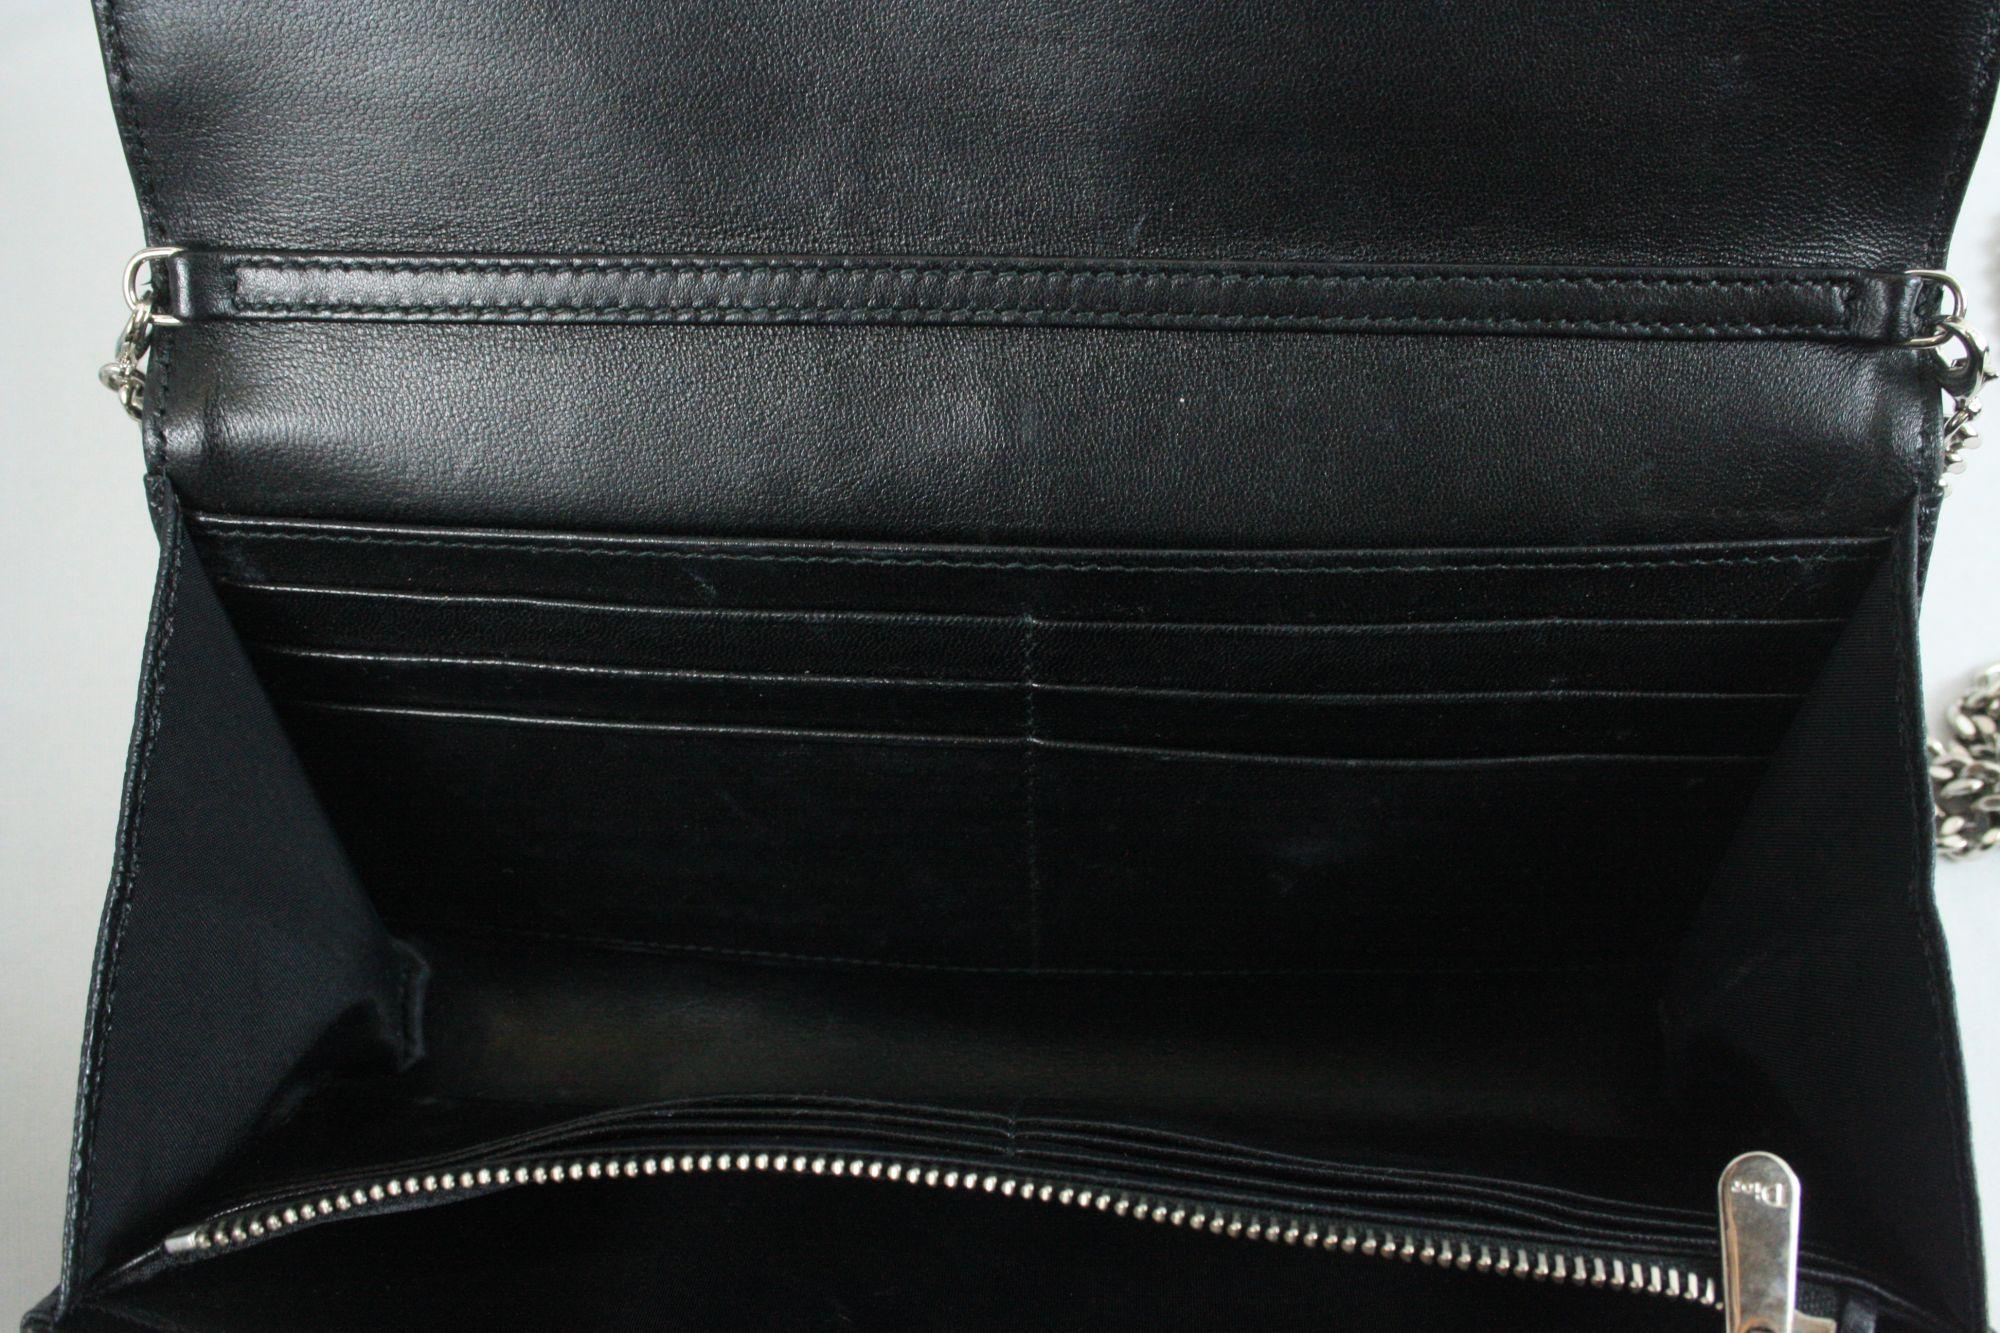 Diorama shoulder bag